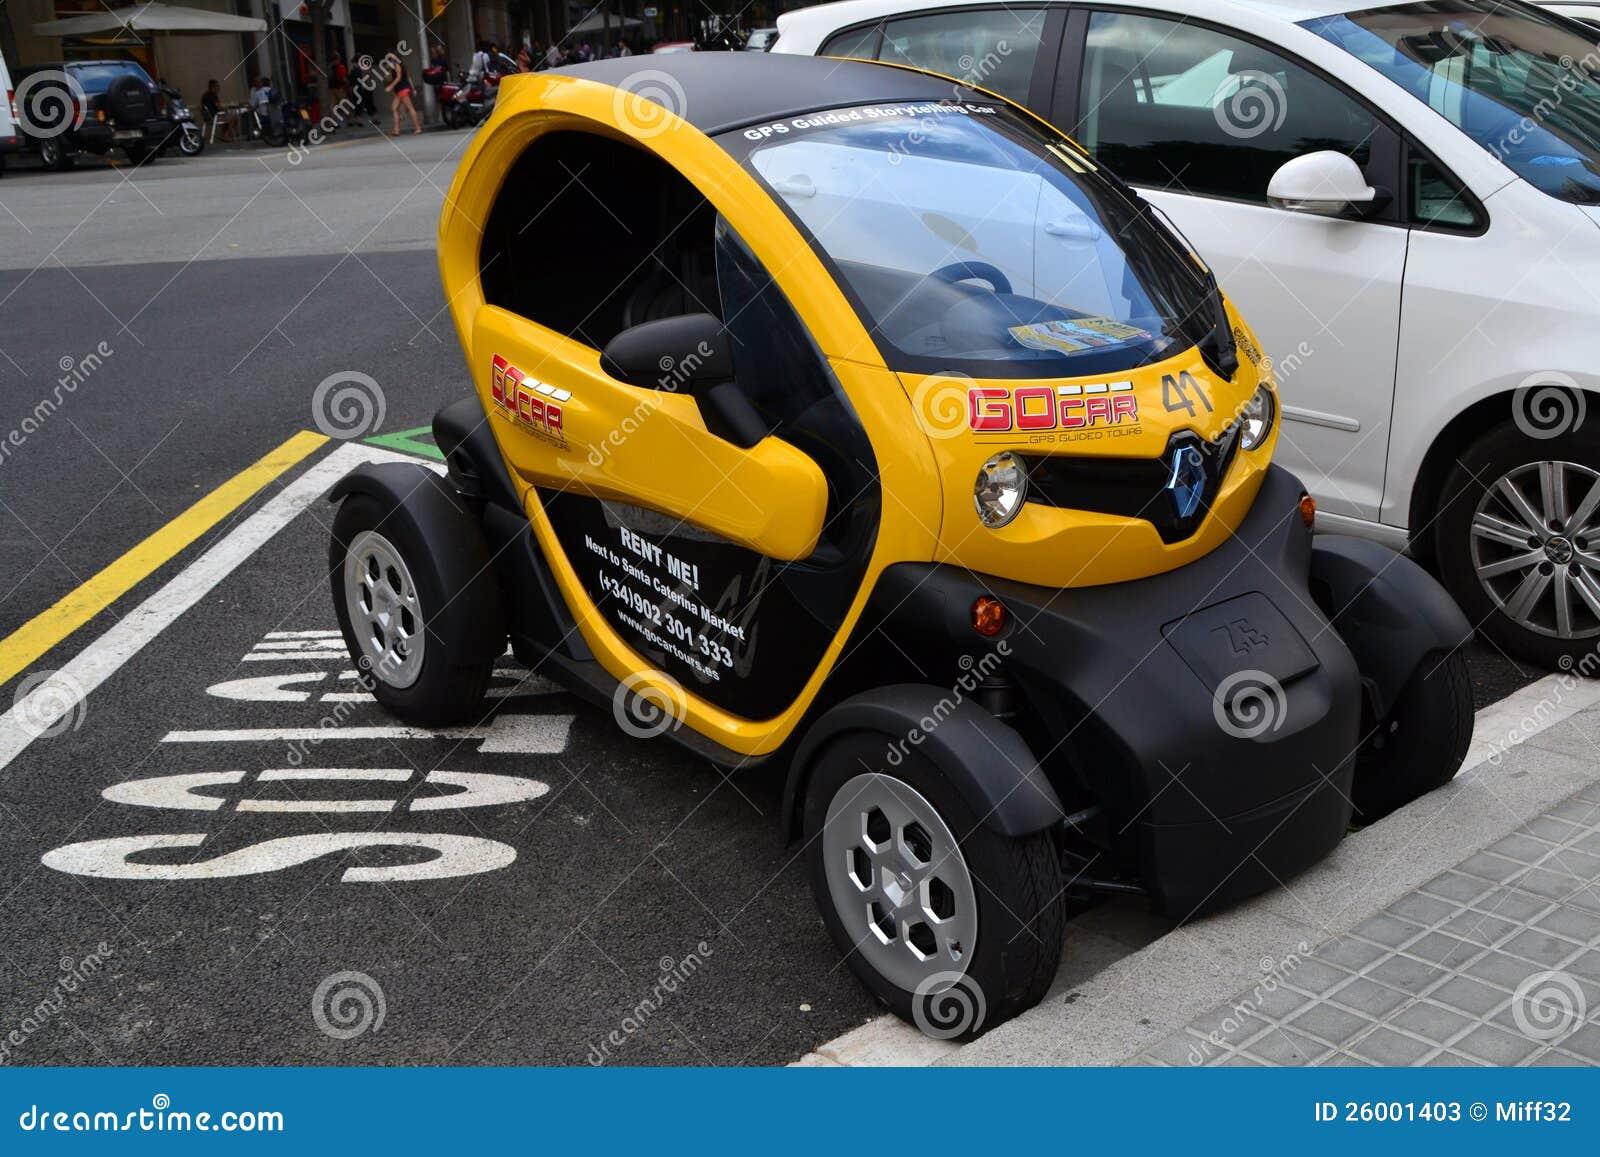 Barcelona Spain Rent A Car